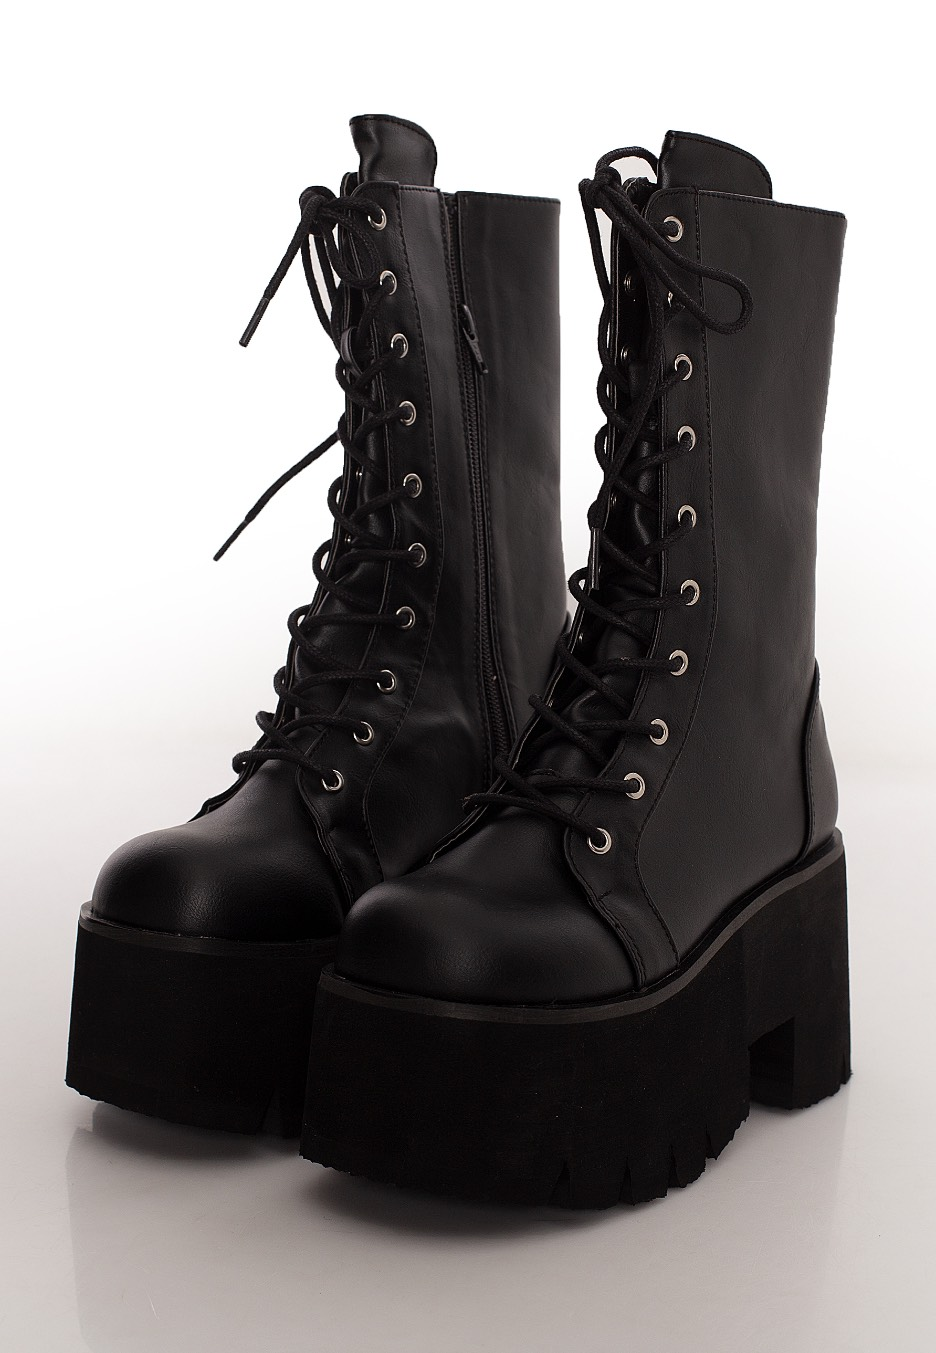 Demonia - Ashes 105 Chunky Heel Black